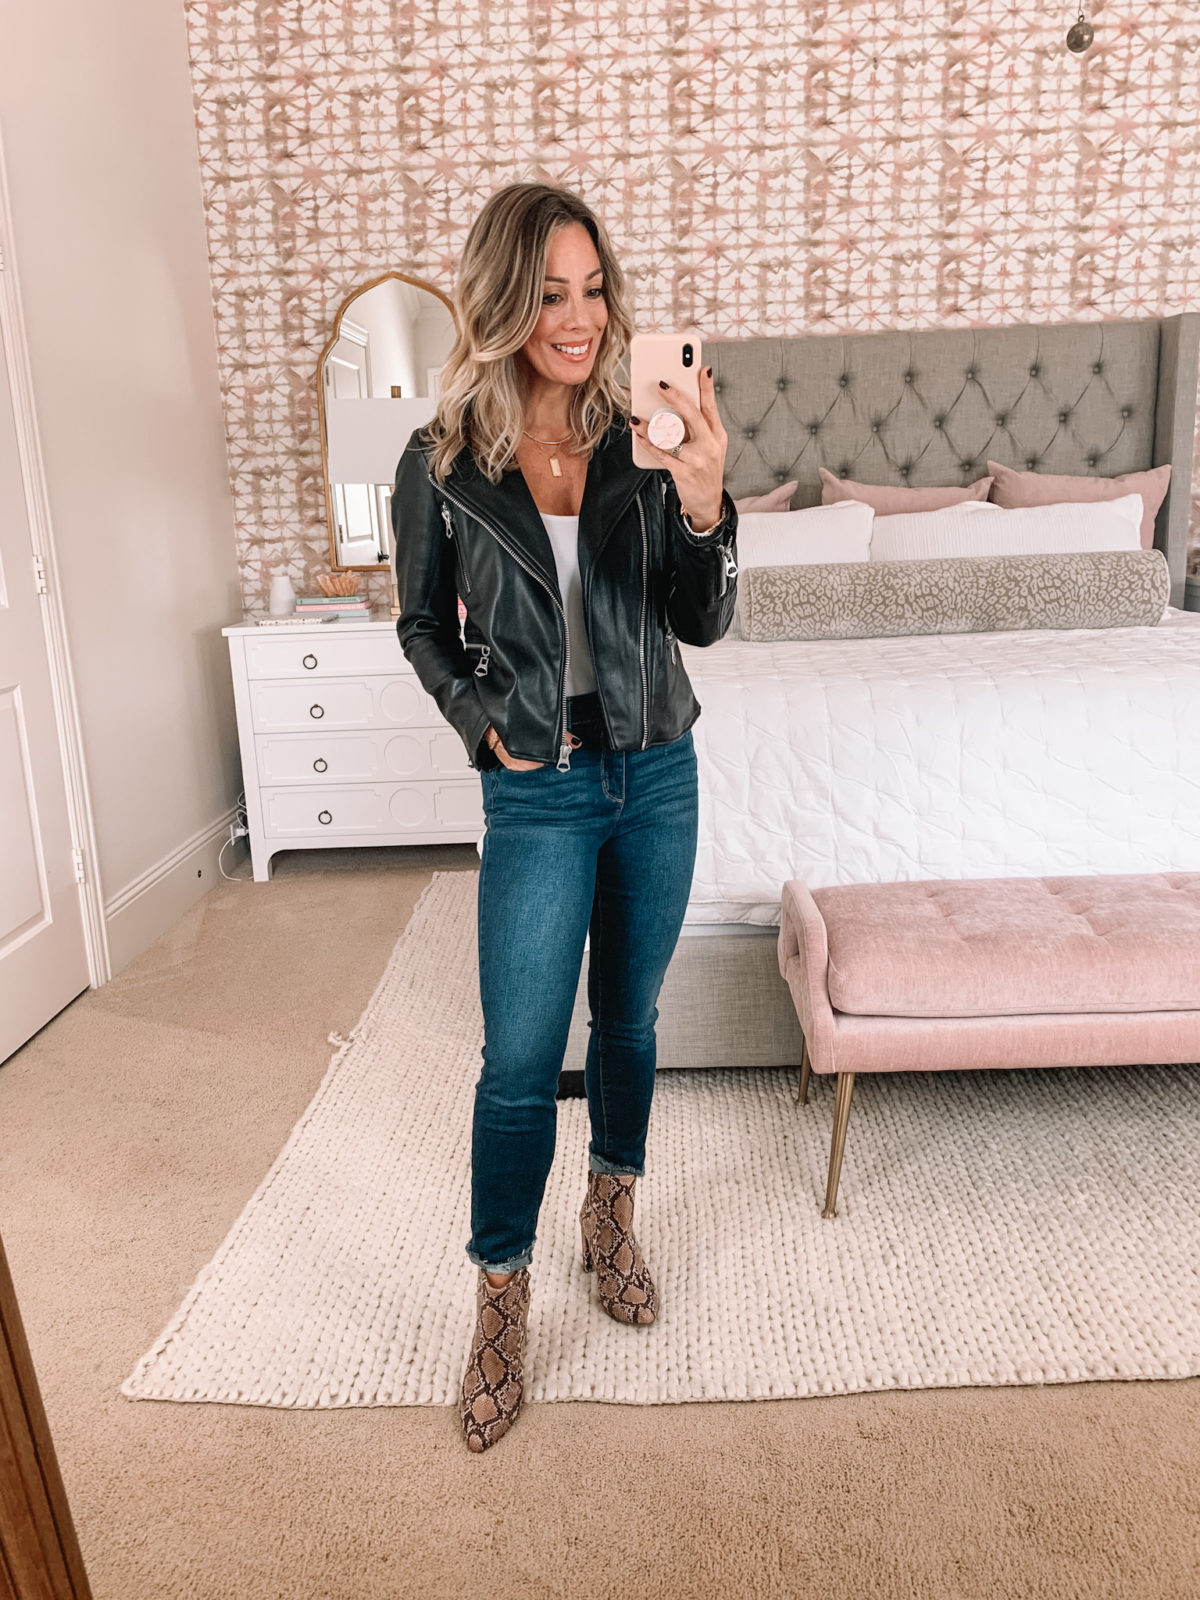 Walmart Fashion, Vegan Leather BIker Jacket, Skinny Jeans, Snakeskin Booties